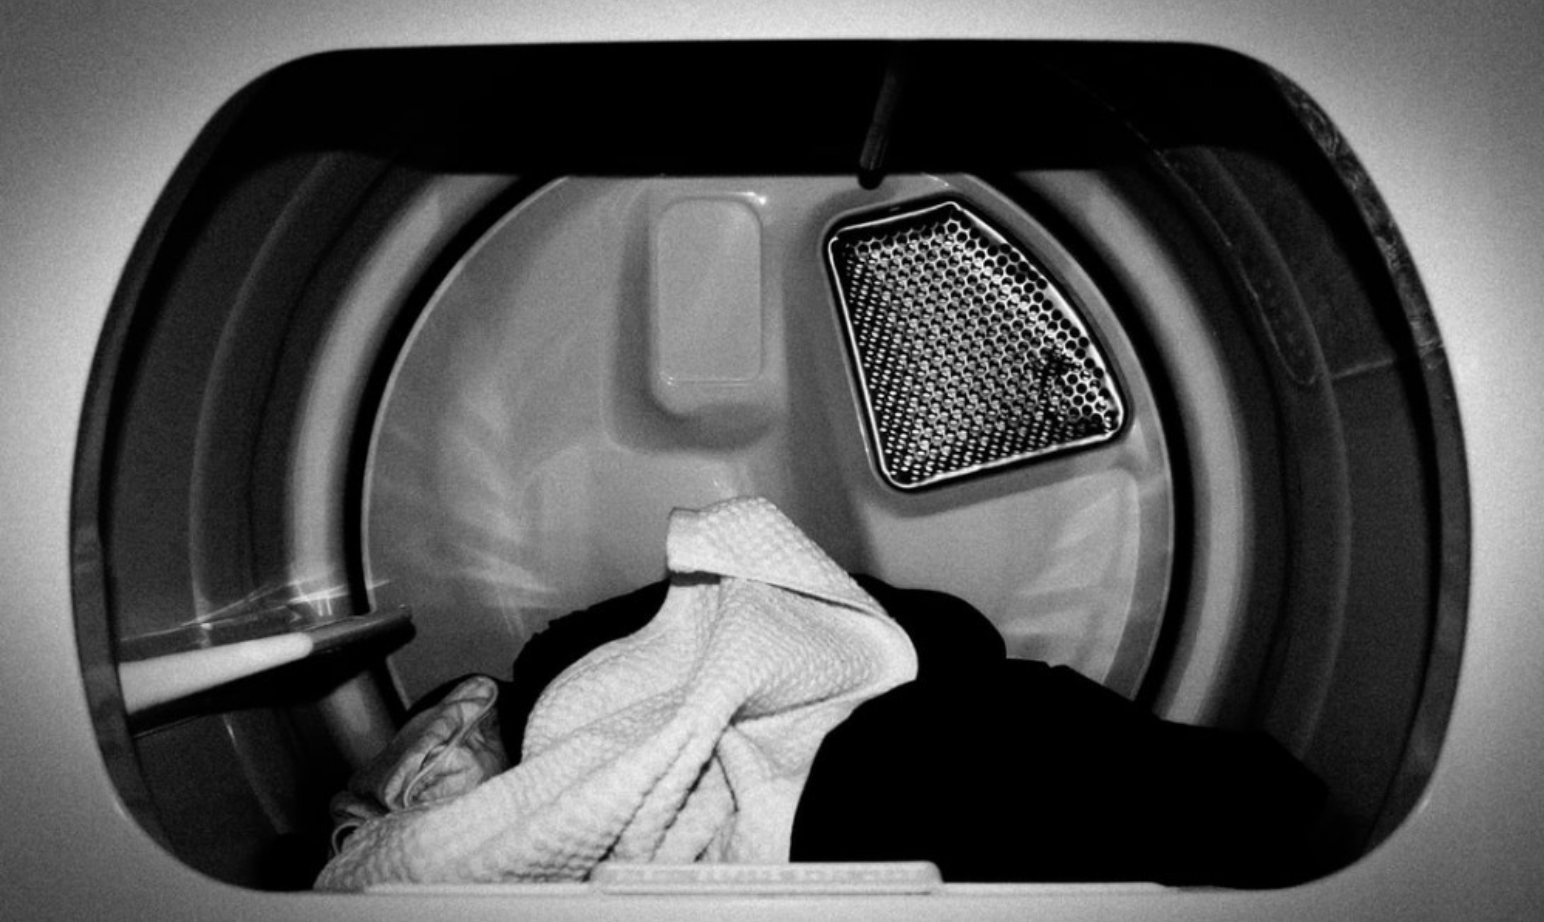 Dryer